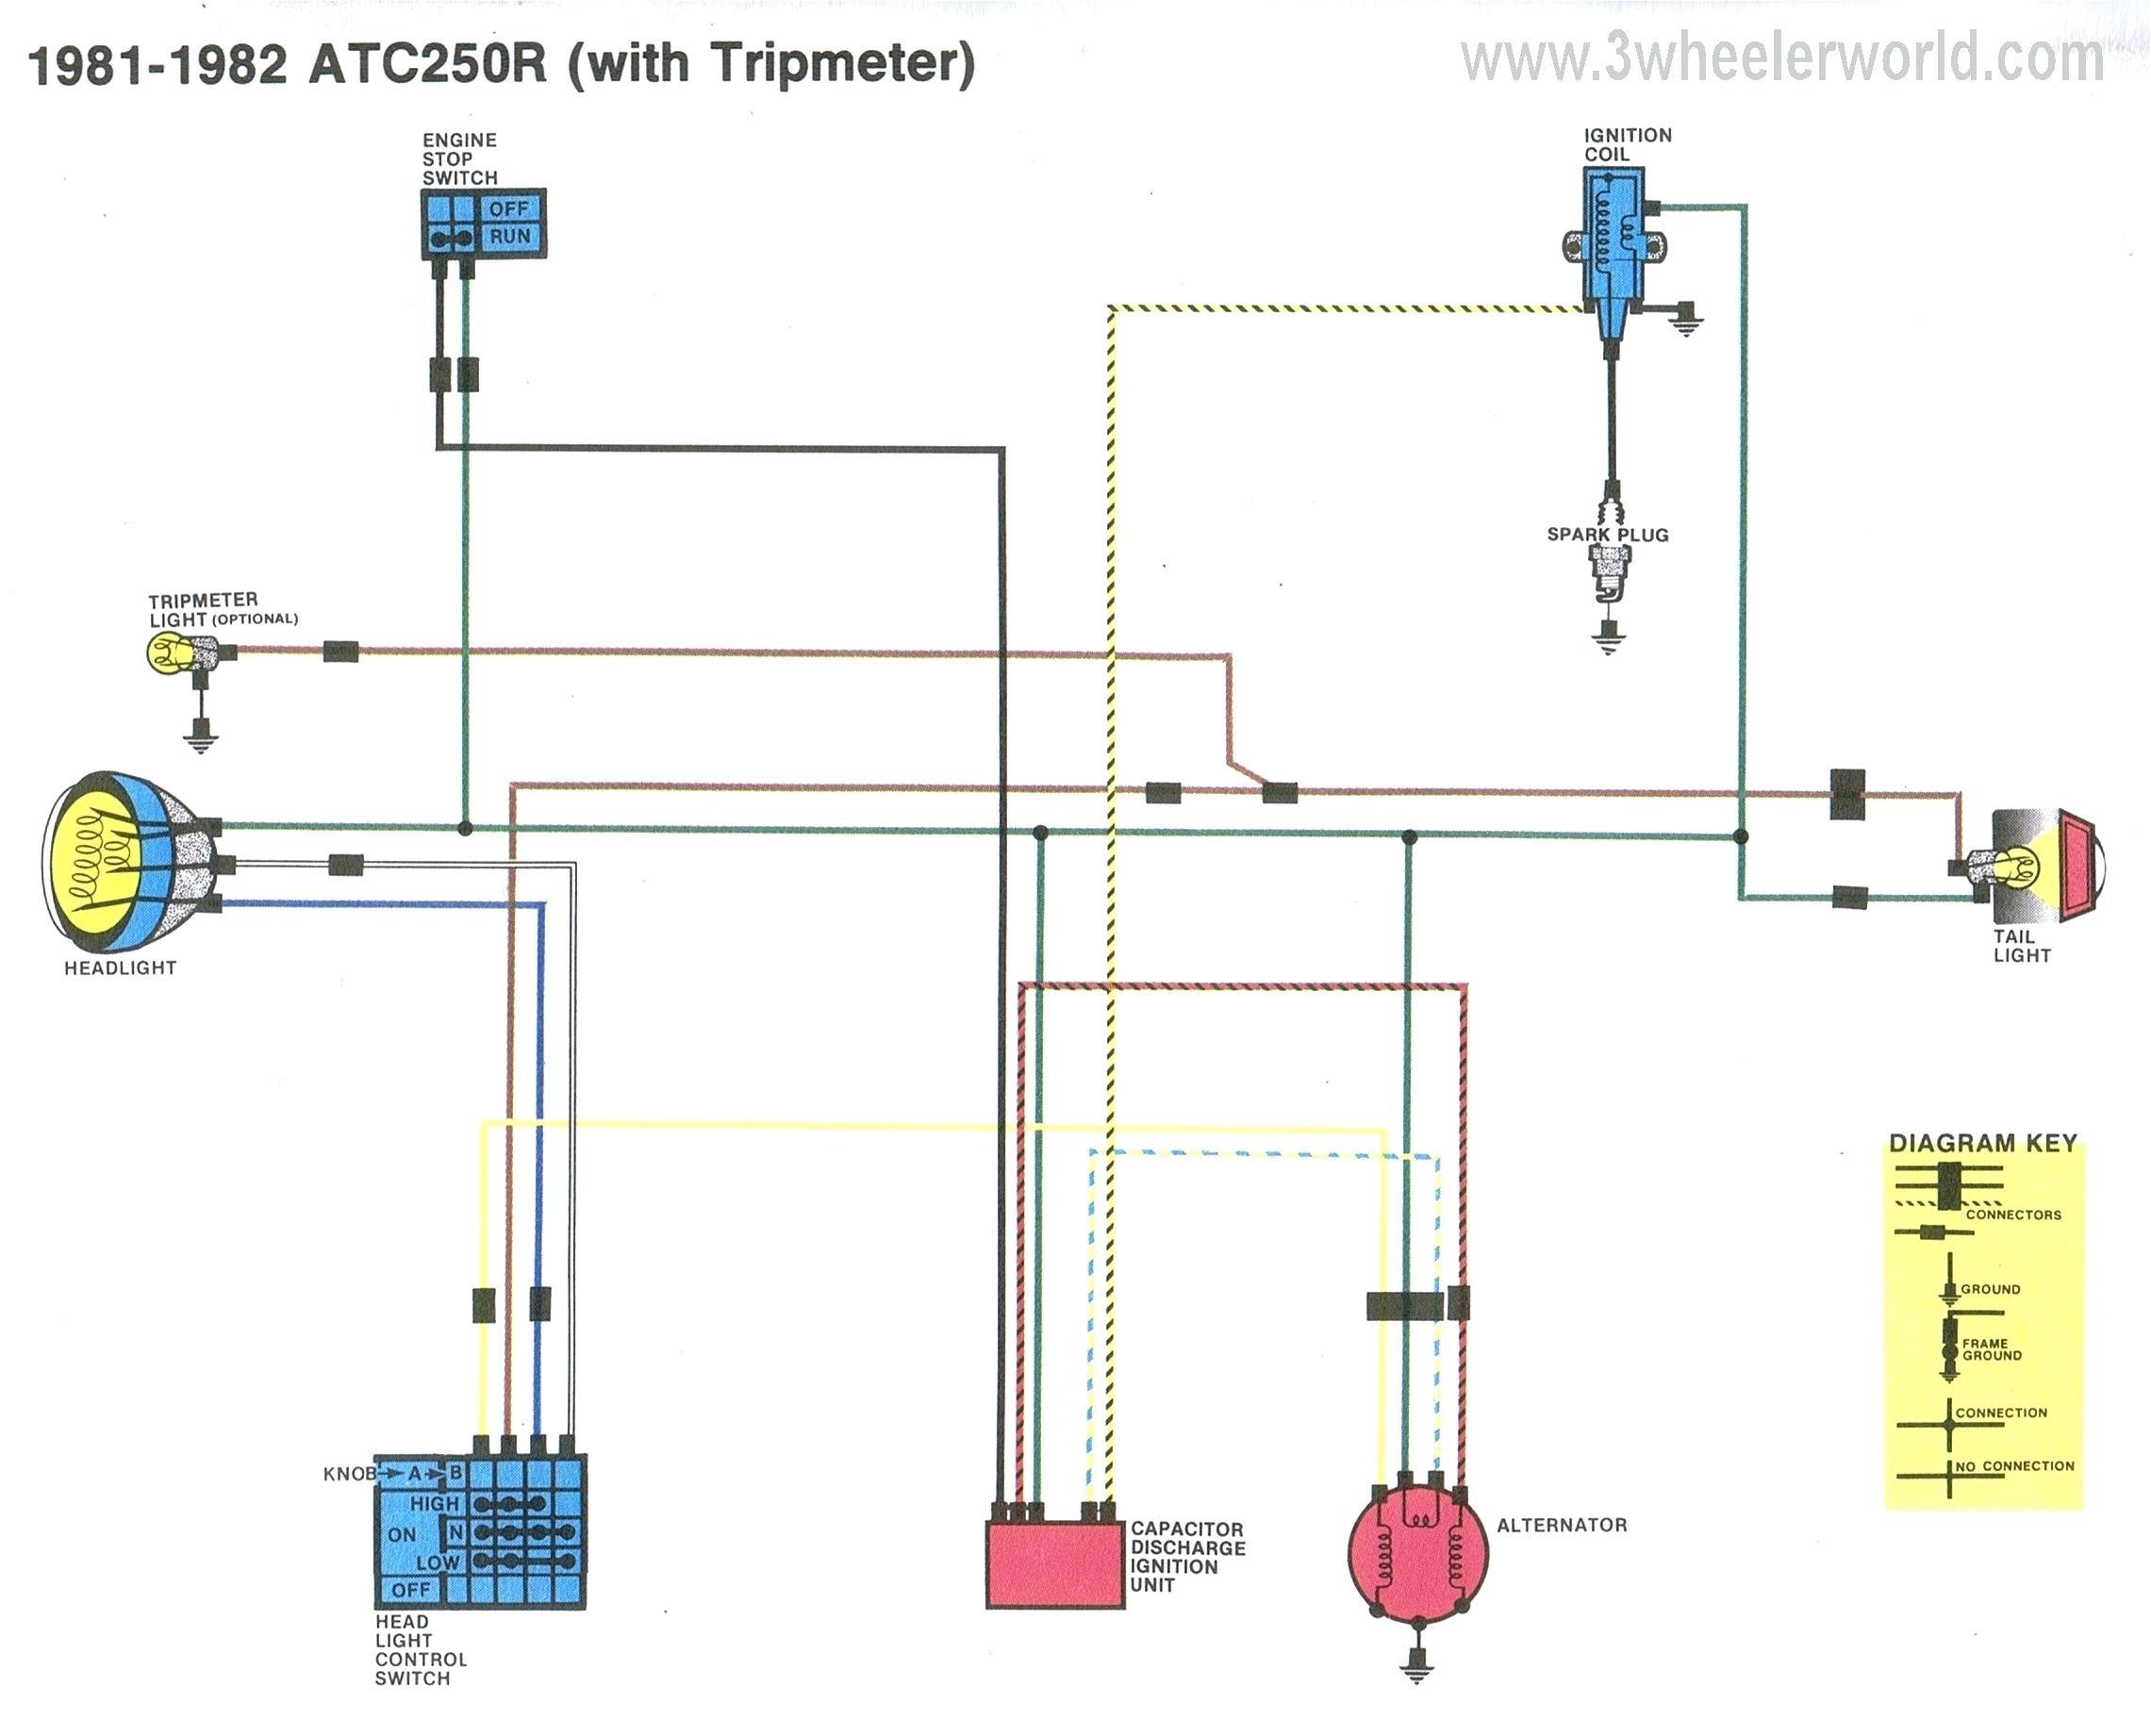 Honda 70 Chaly Wiring Diagram Page 4 And Schematics Xrm 125 Pdf Engine Dodge Free Rh Detoxicrecenze Com